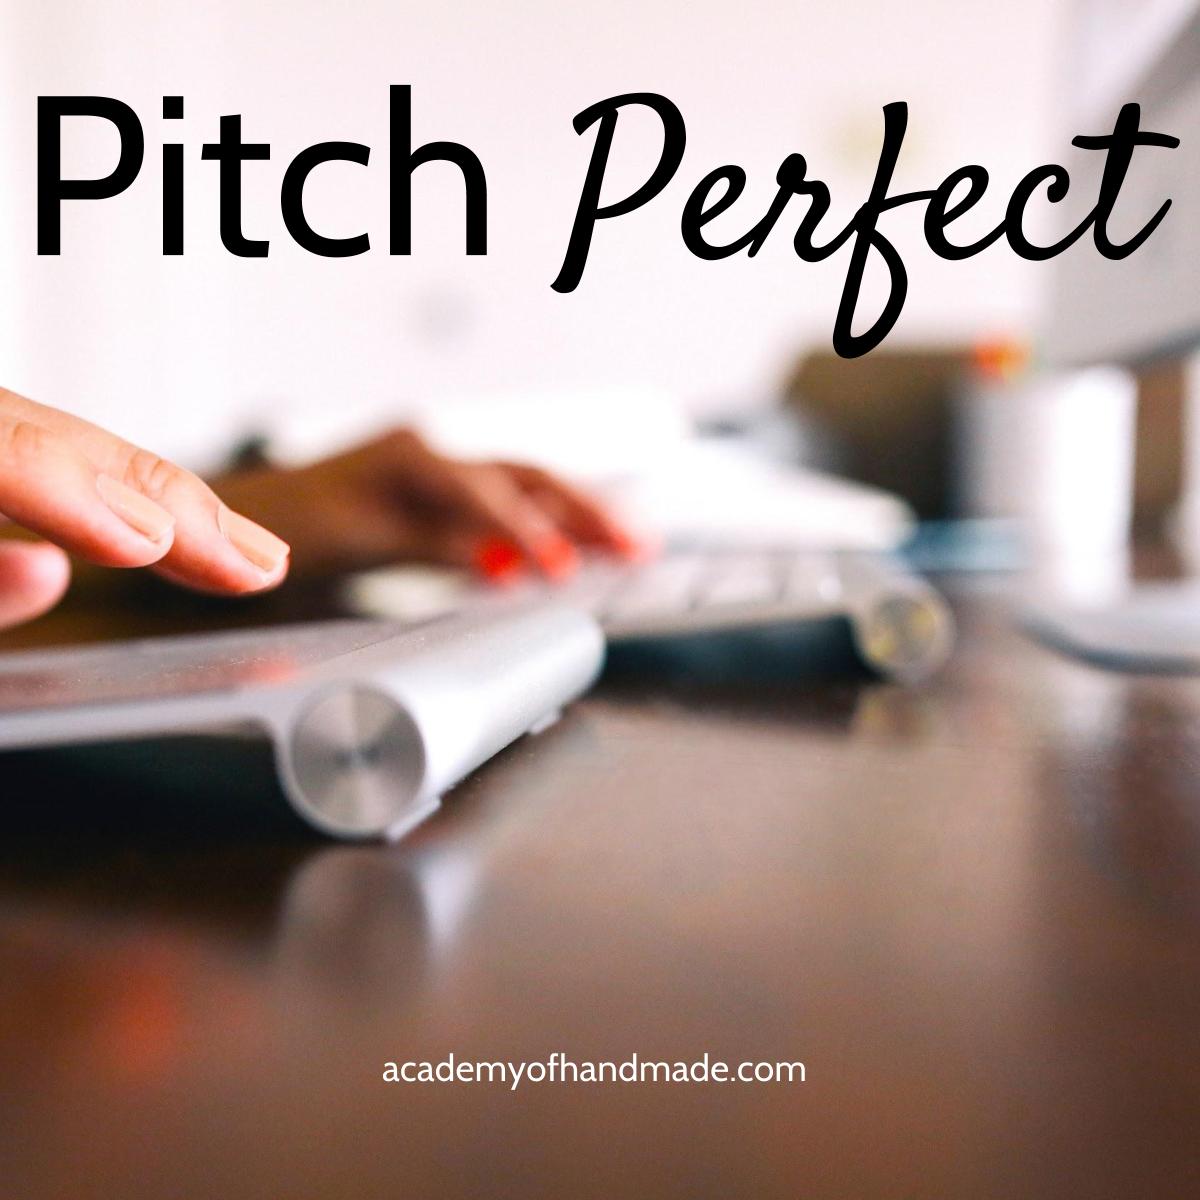 pitching-academy-of-handamde.png